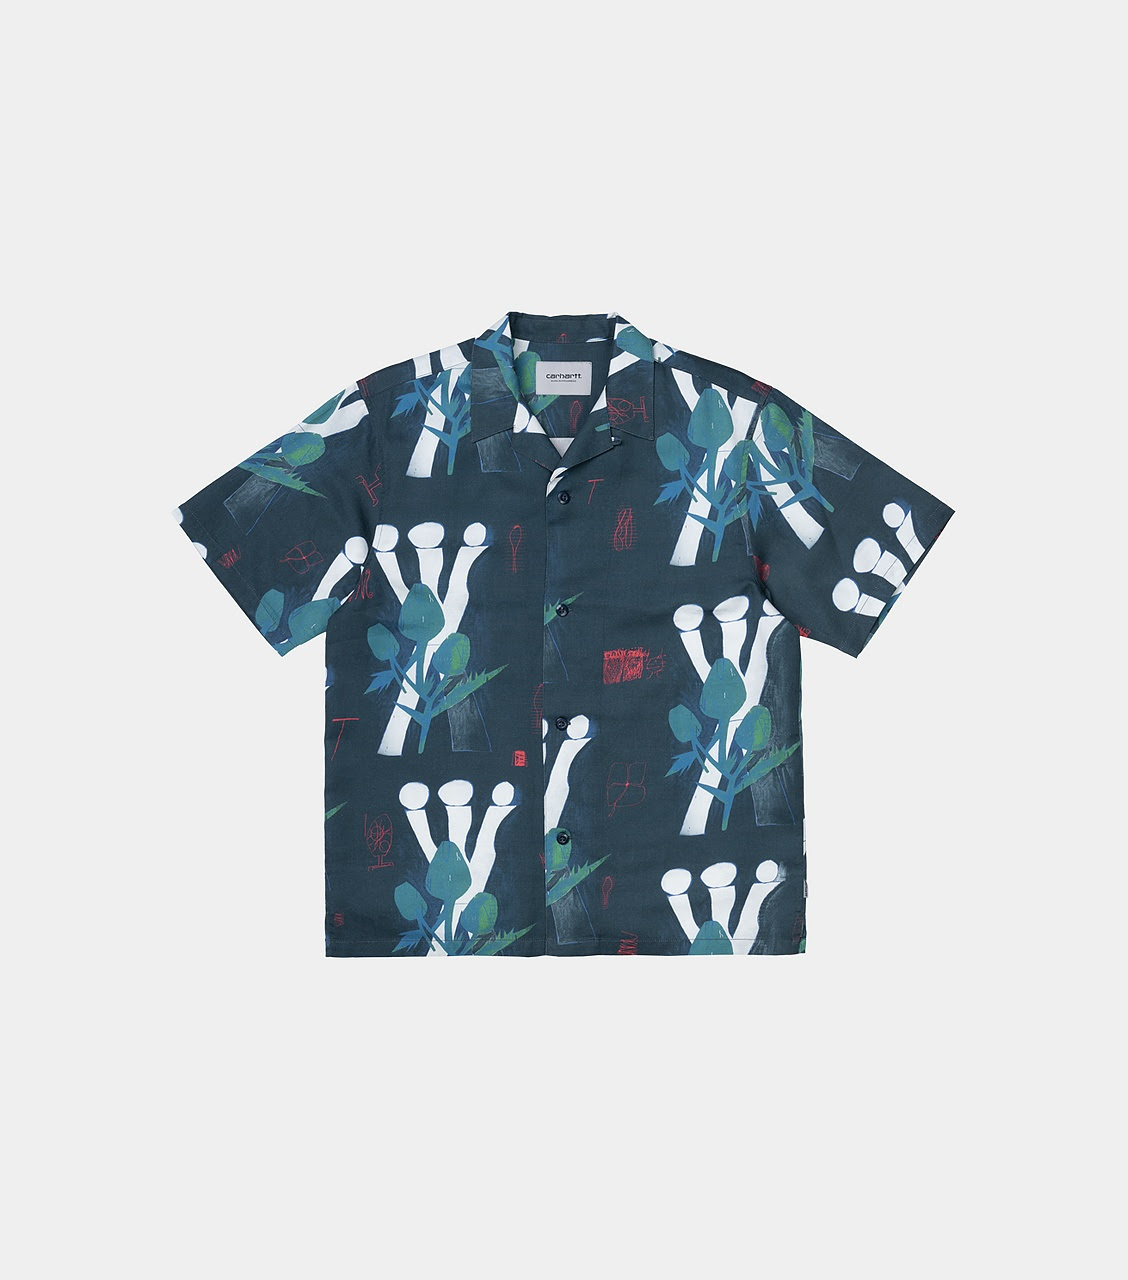 S/S Tom Król Flowers Shirt